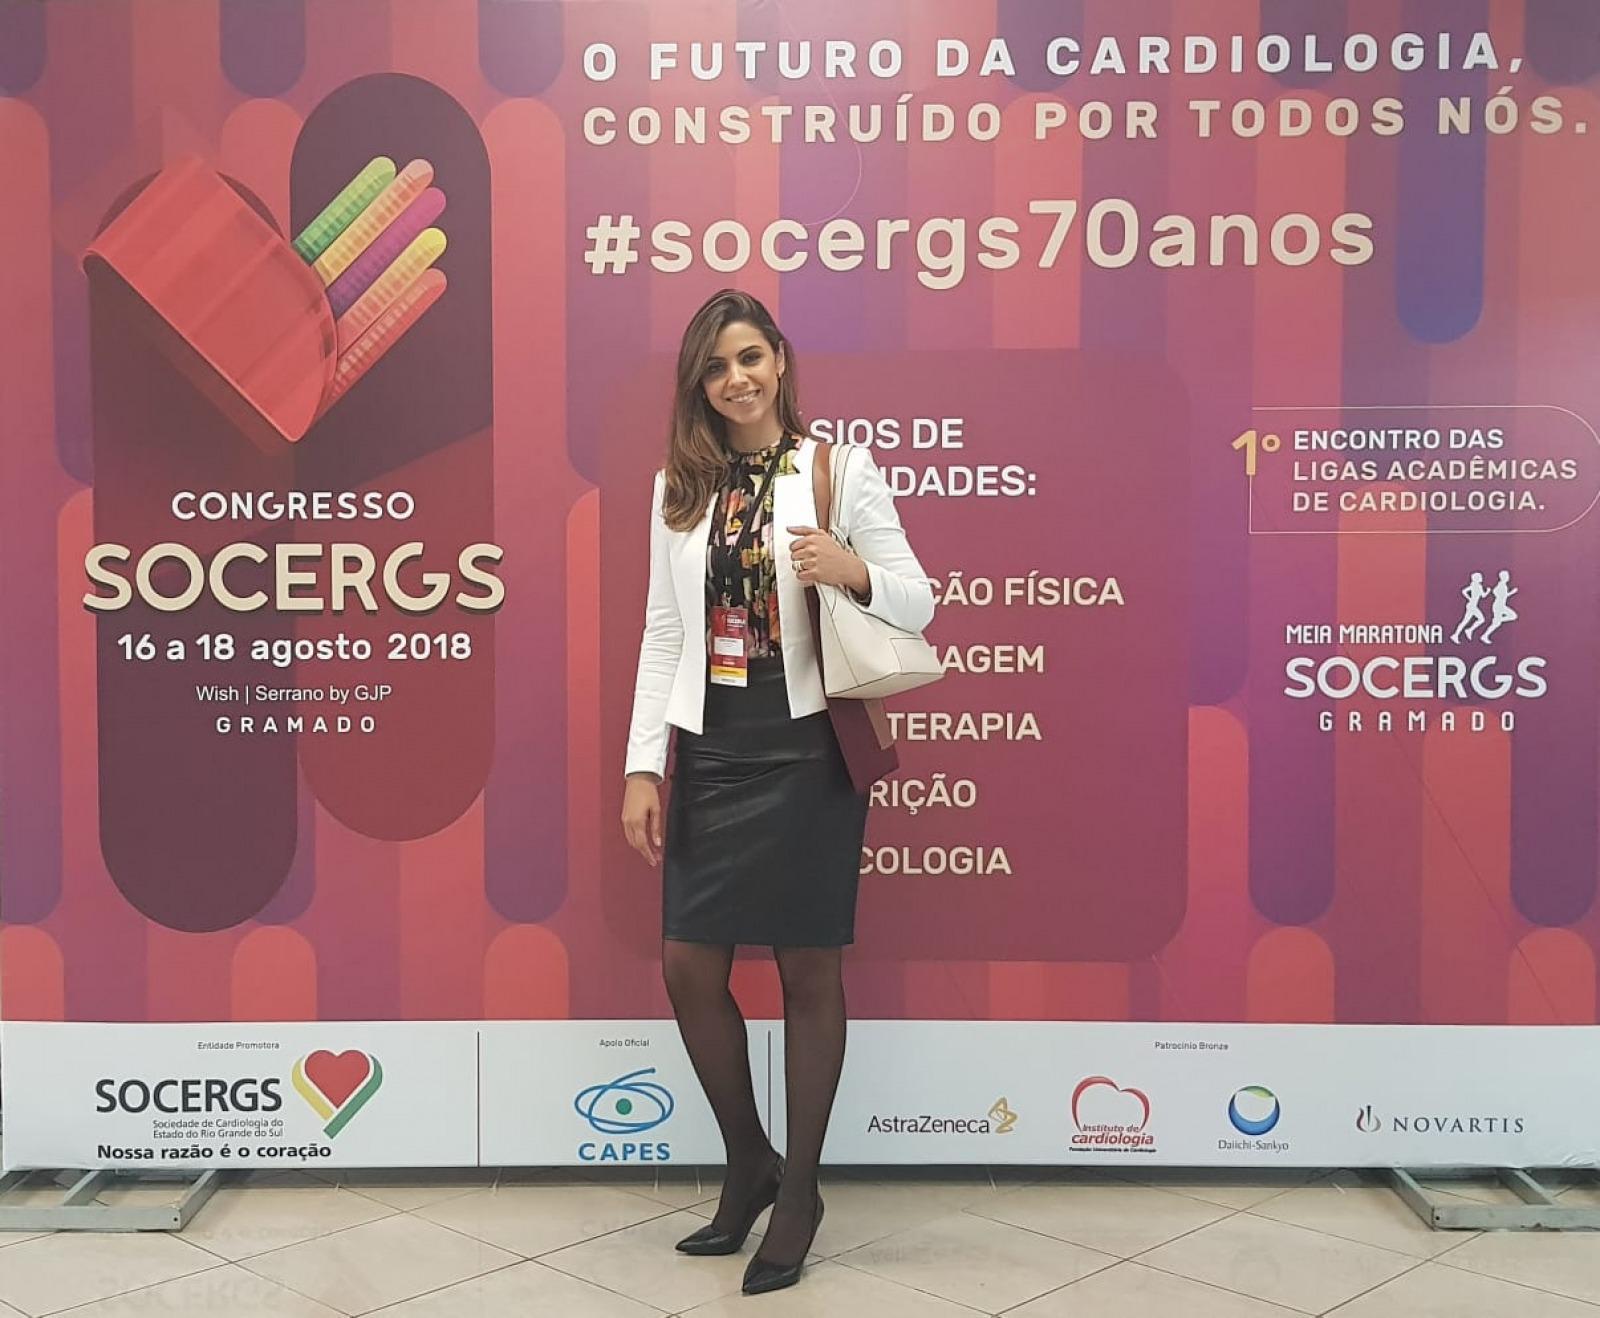 SOCERGS 2018